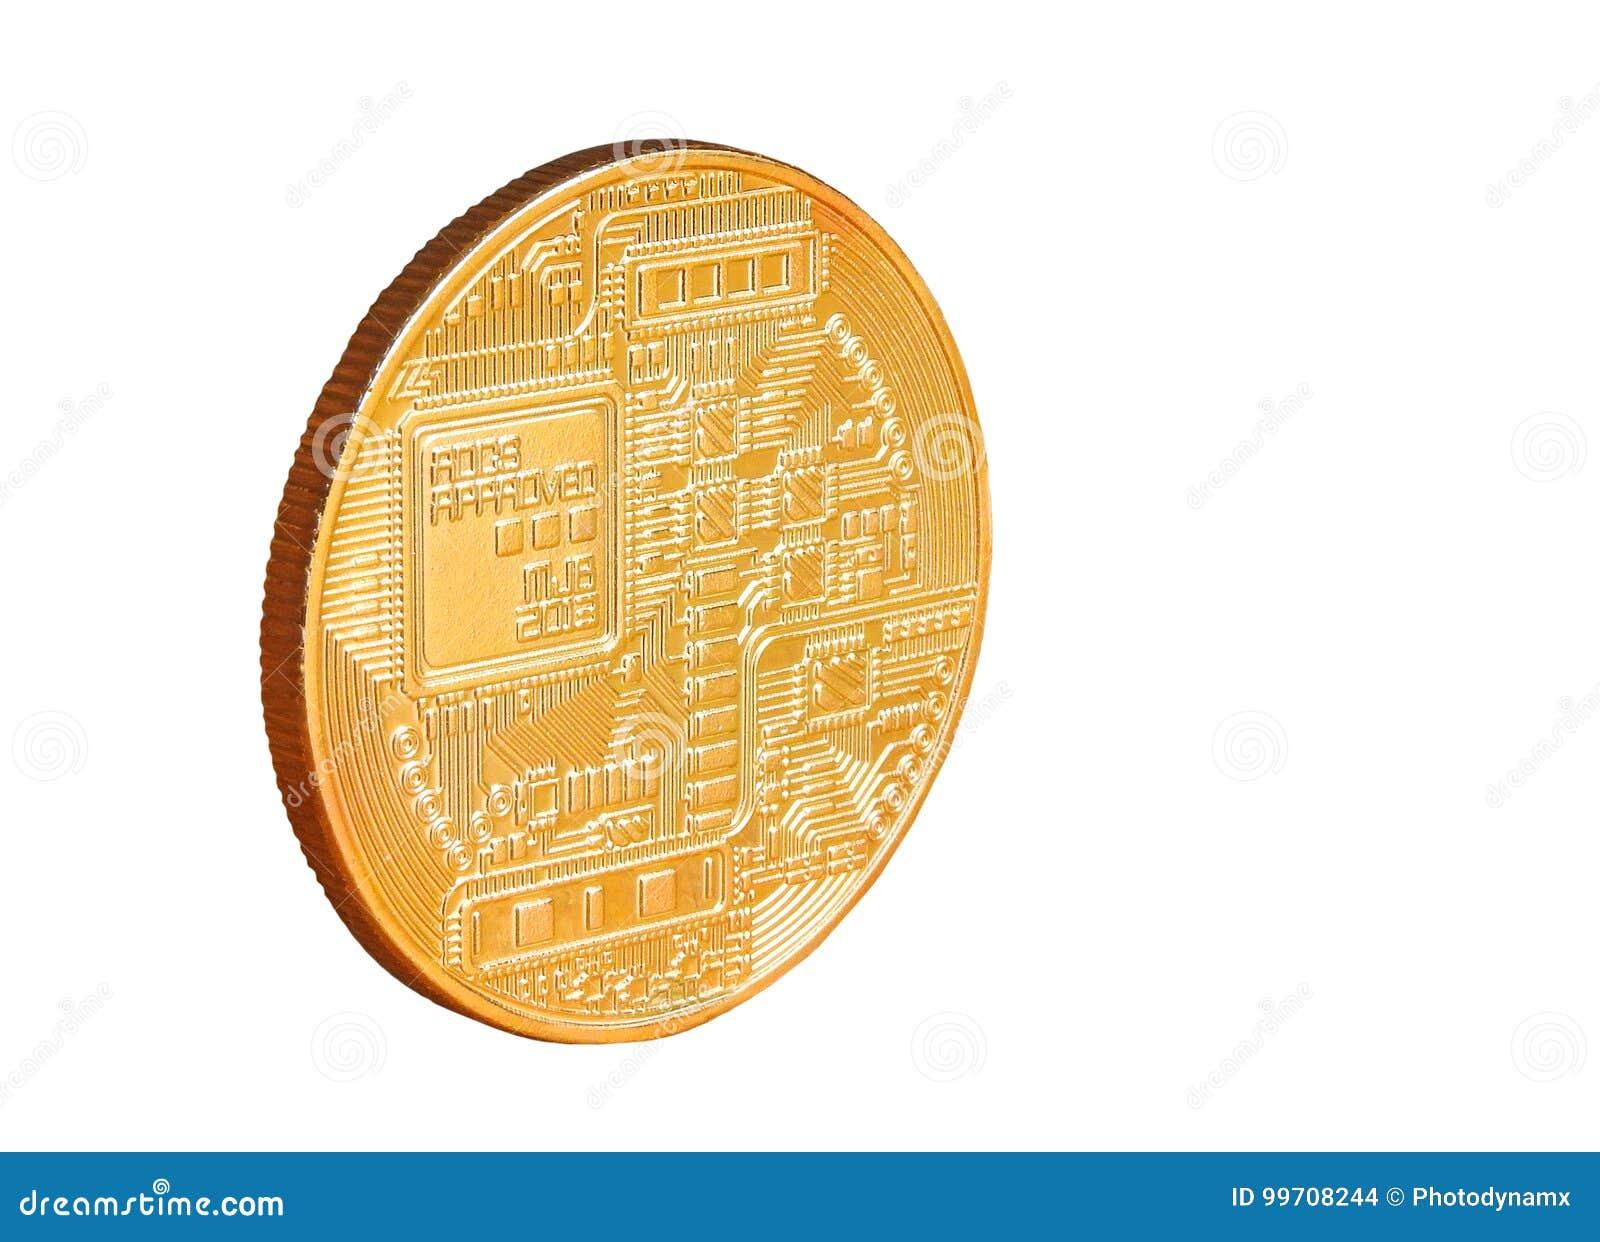 free mining of bitcoin